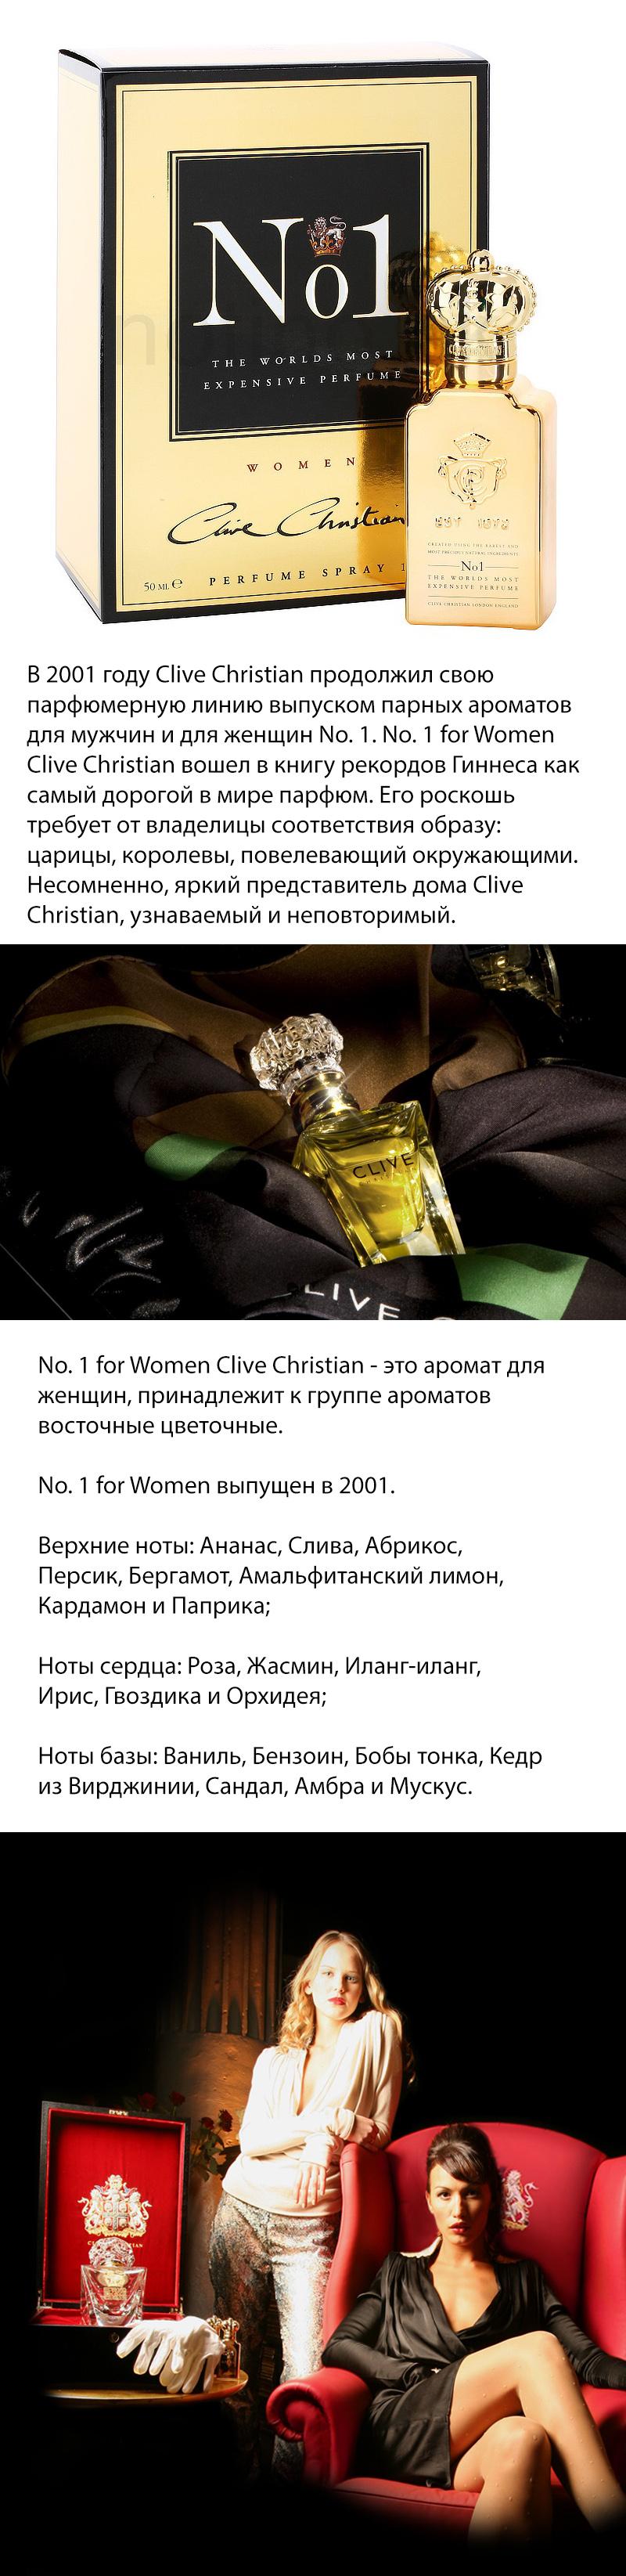 clive-christian-no-1